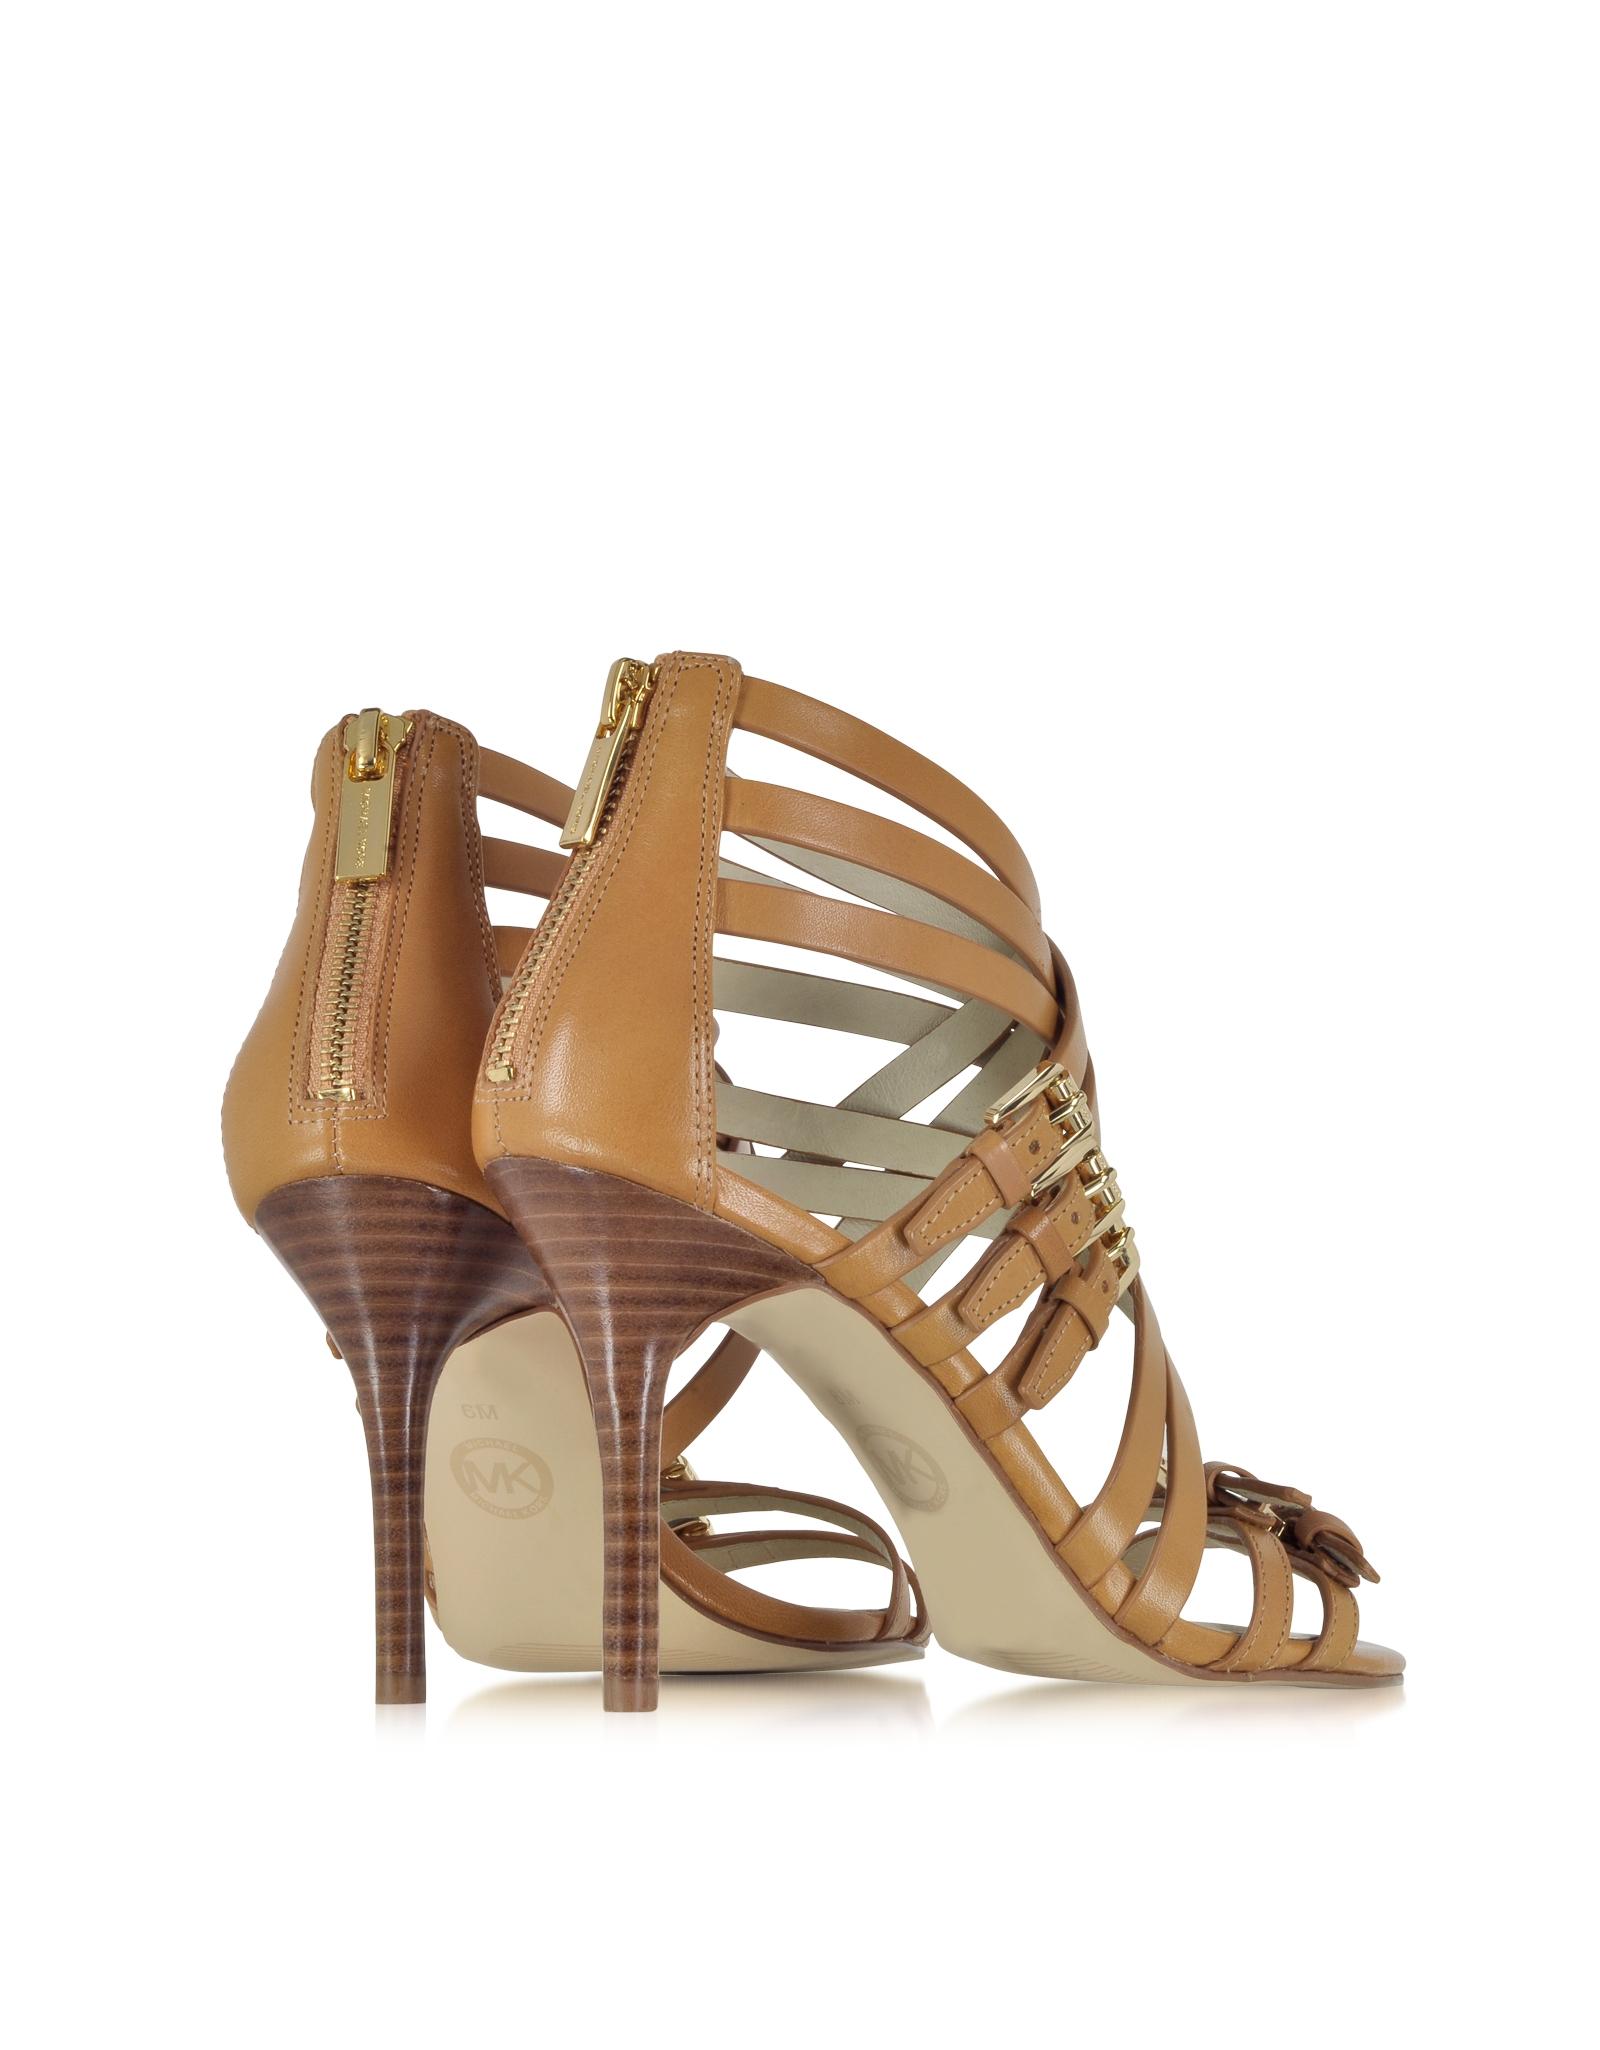 Lyst Michael Kors Ava Peanut Leather Sandal In Brown